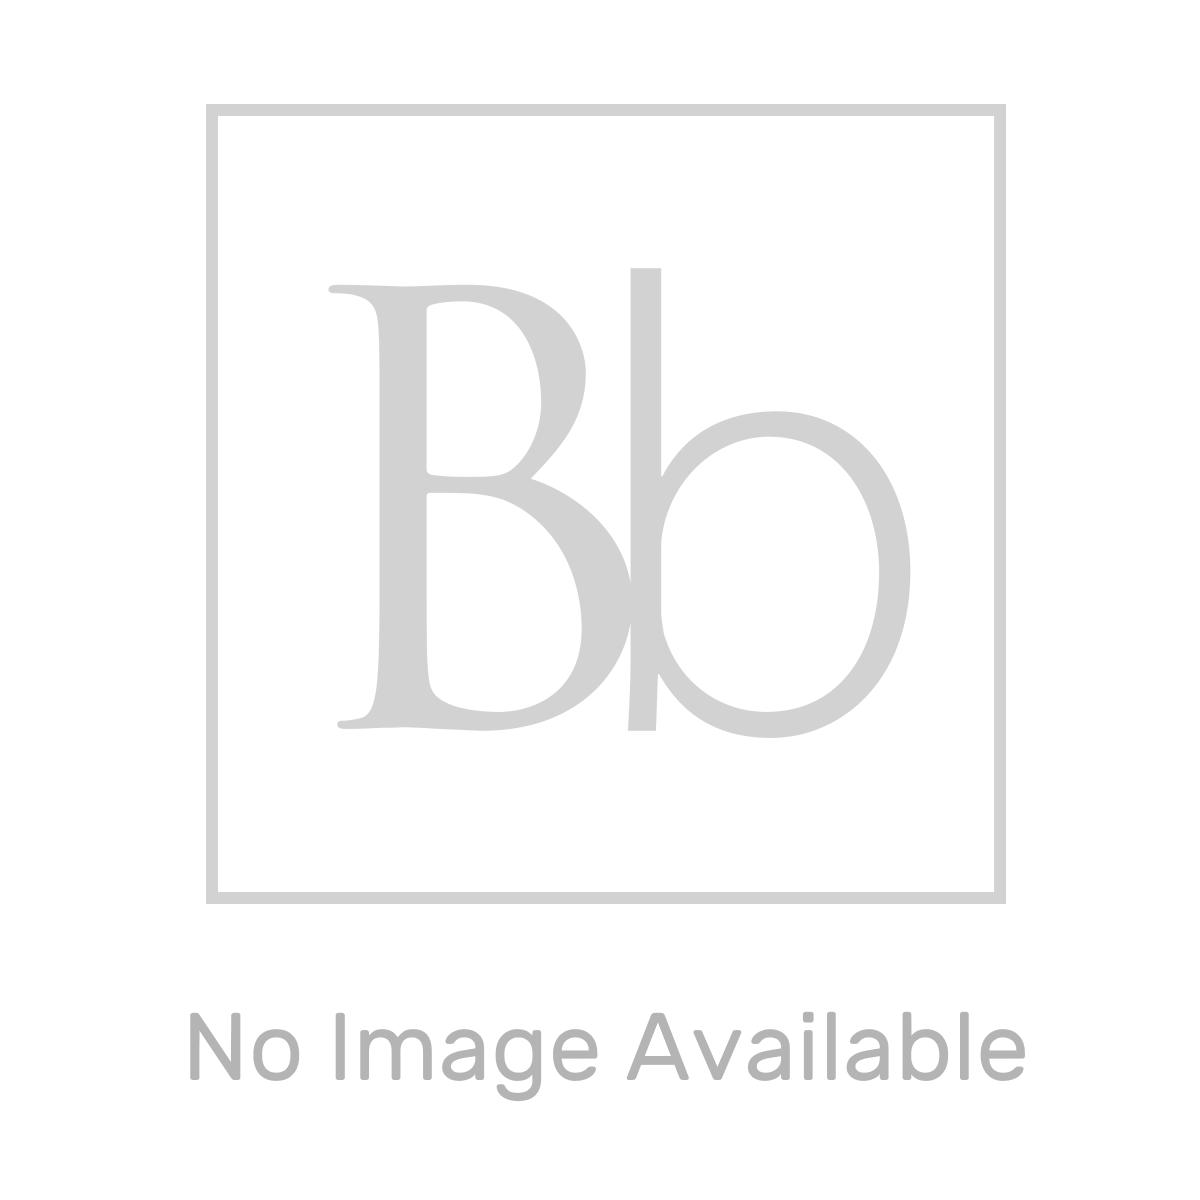 RAK Precious Macaubus Wall Hung Counter Basin 1000mm with Brackets Measurements